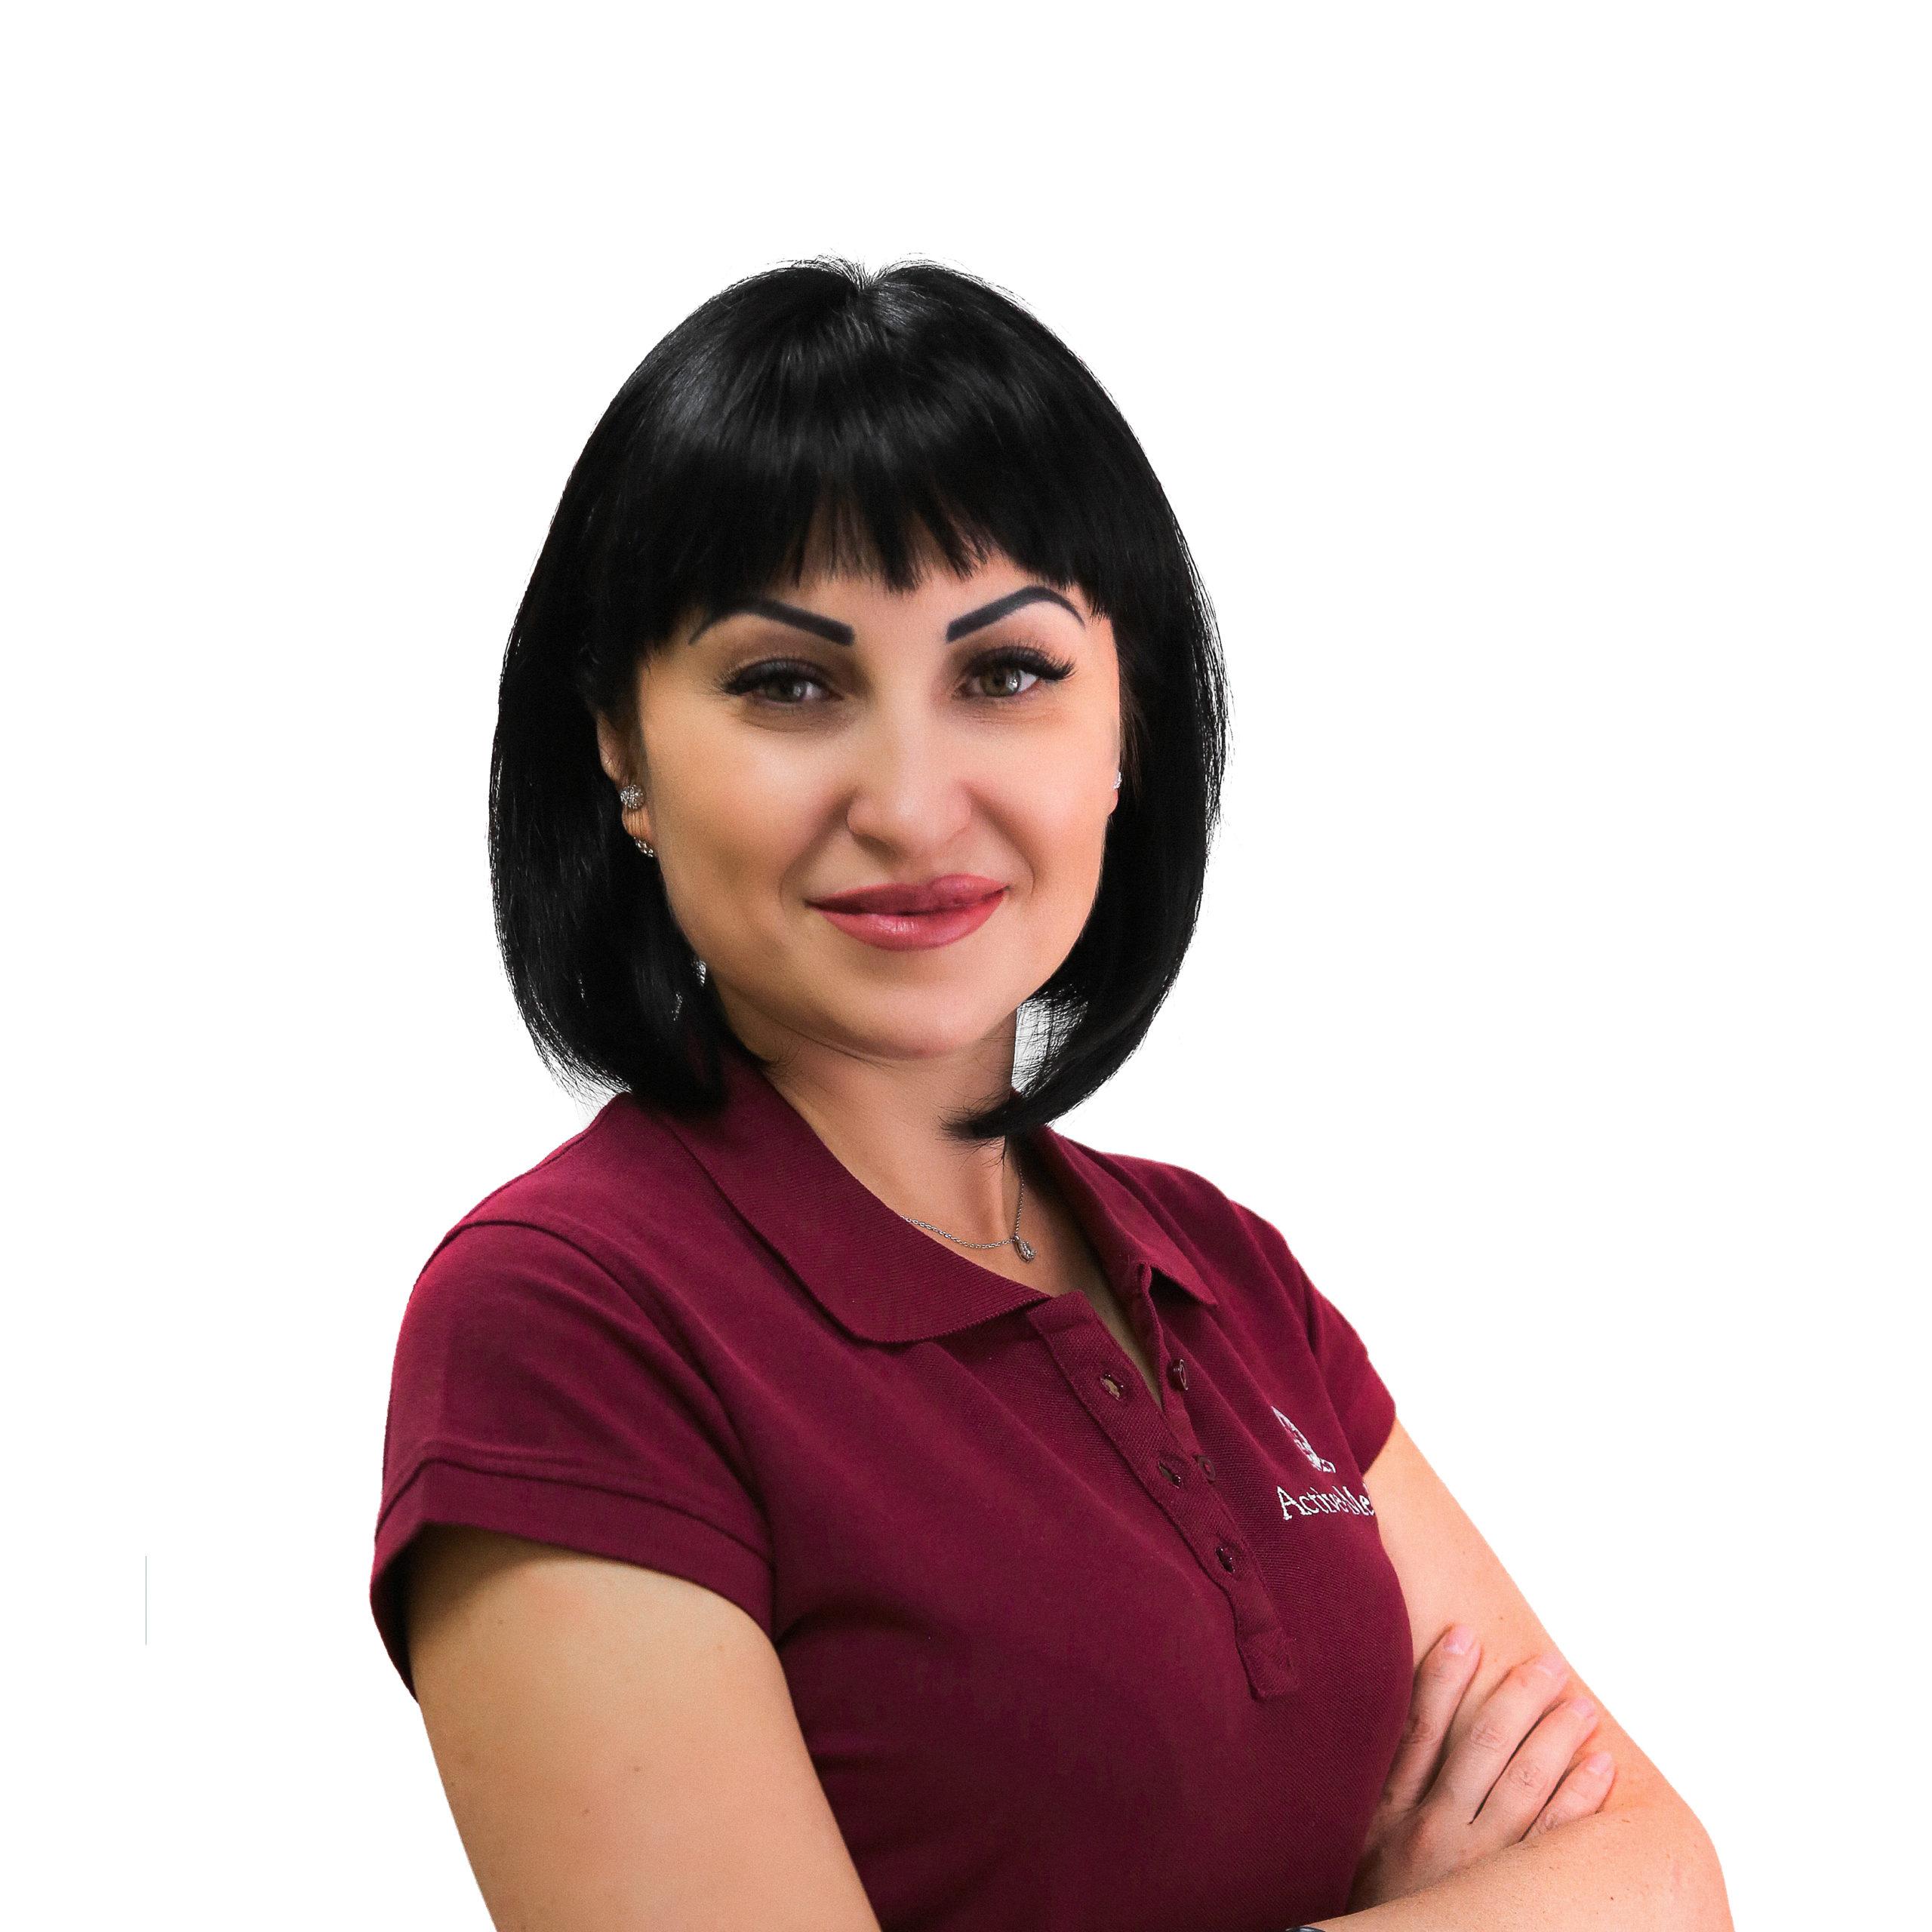 Таран Лариса Владимировна